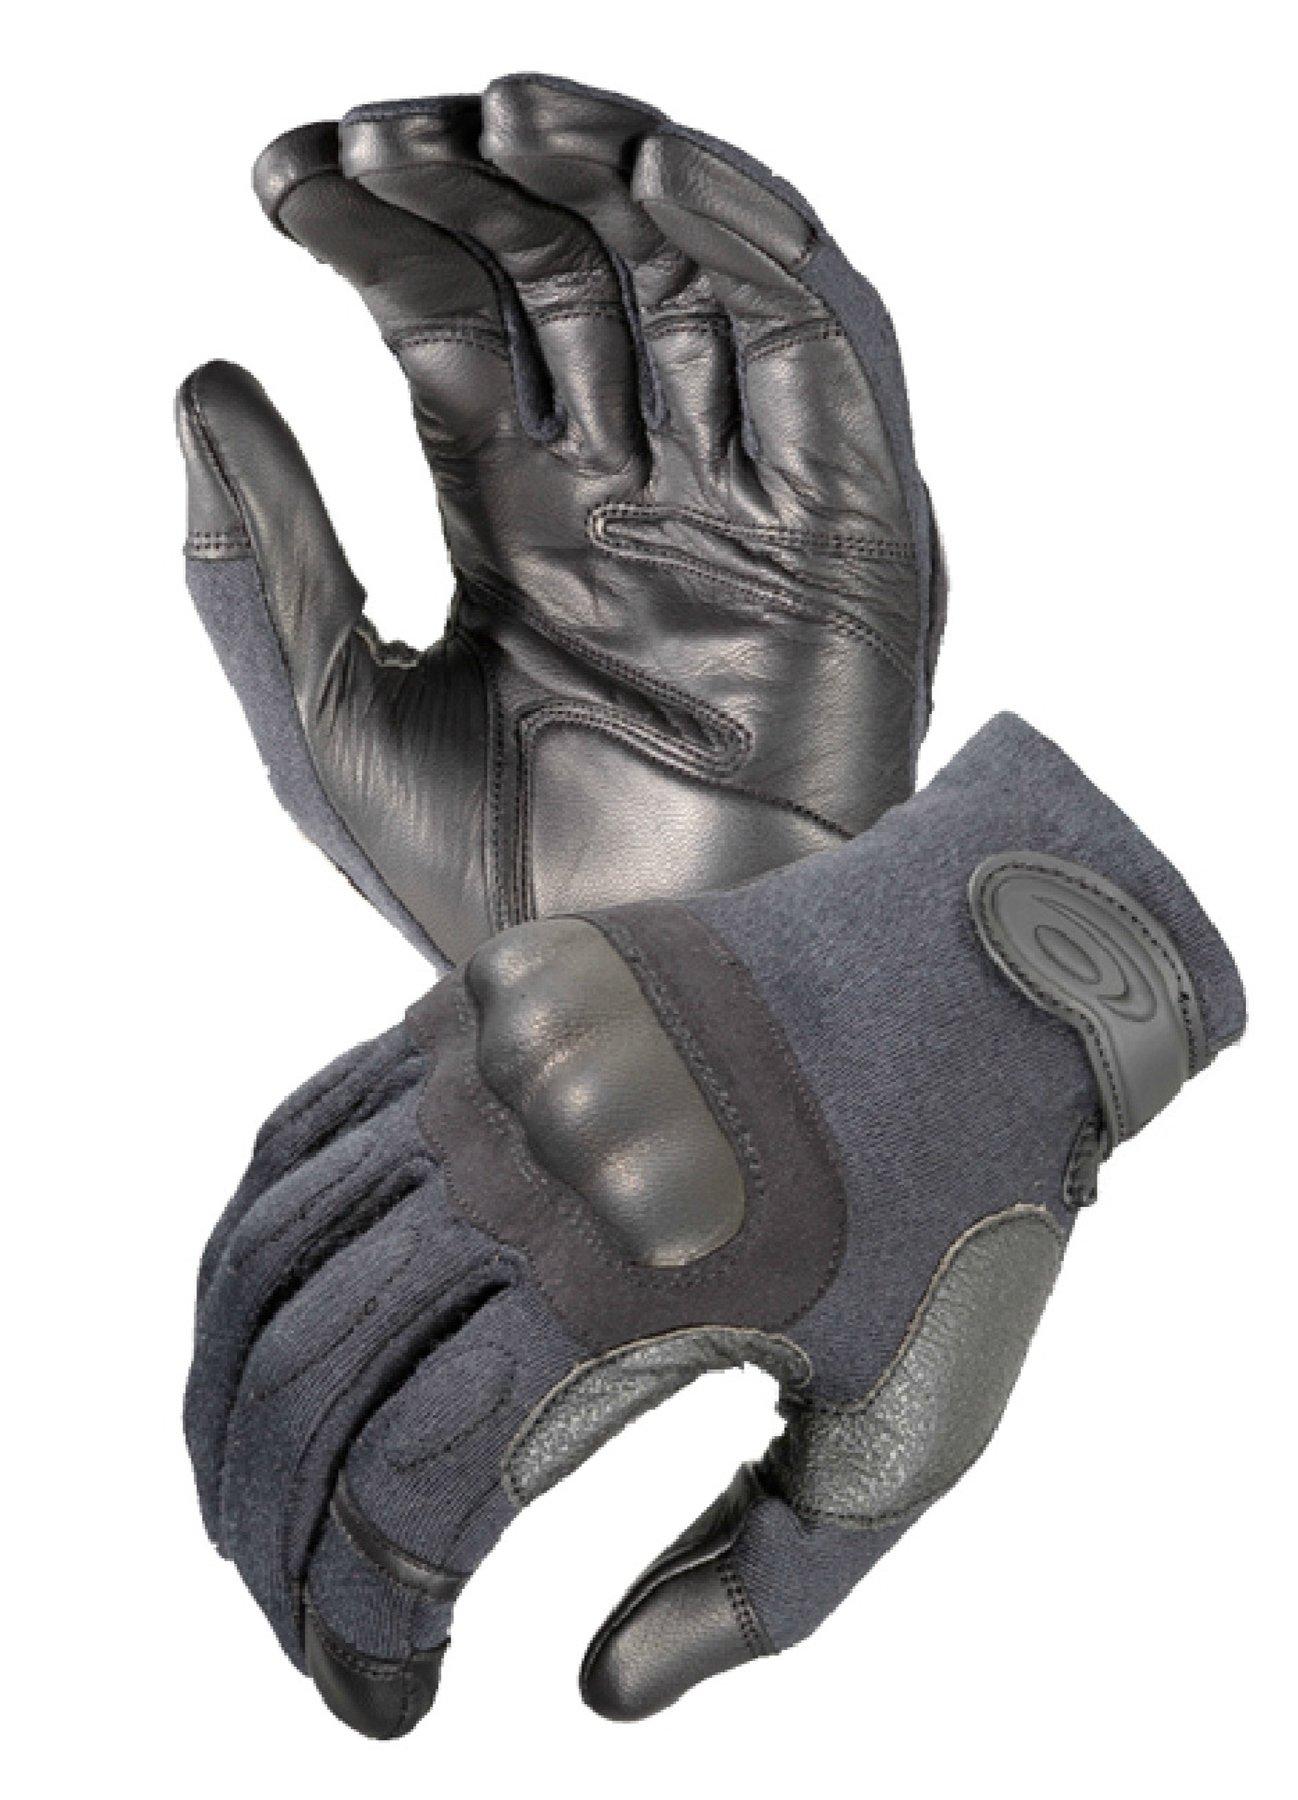 Hatch SOG-HK300 Operator  HK Glove, Black, Medium